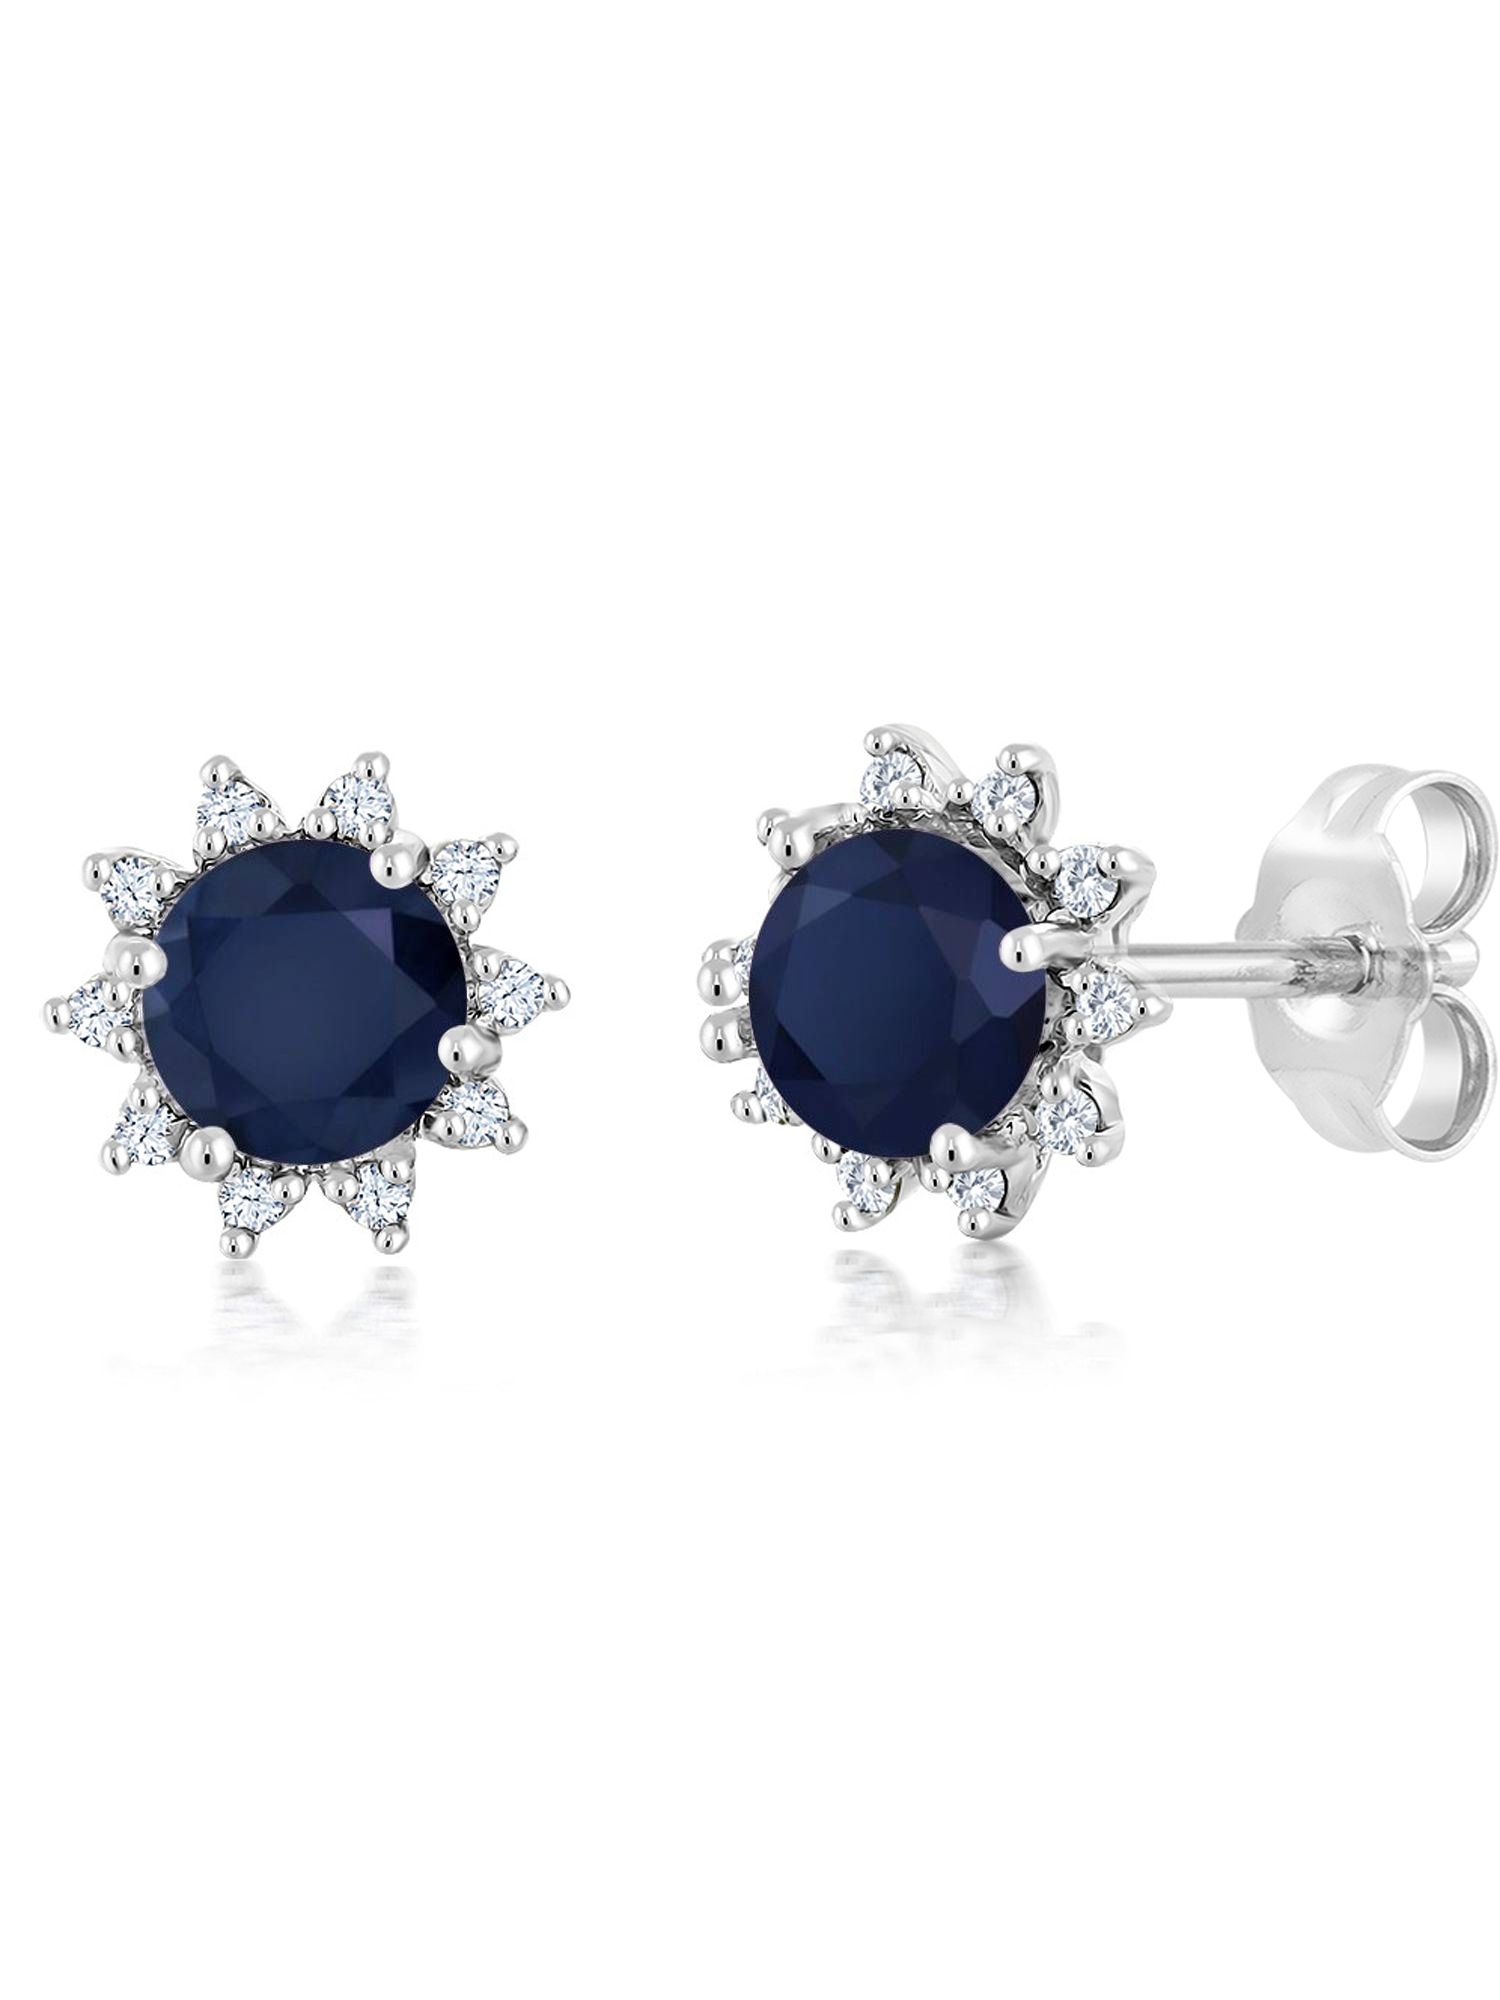 18K White Gold Diamond Stud Earrings Round 4mm Blue Sapphire 0.72 Ct